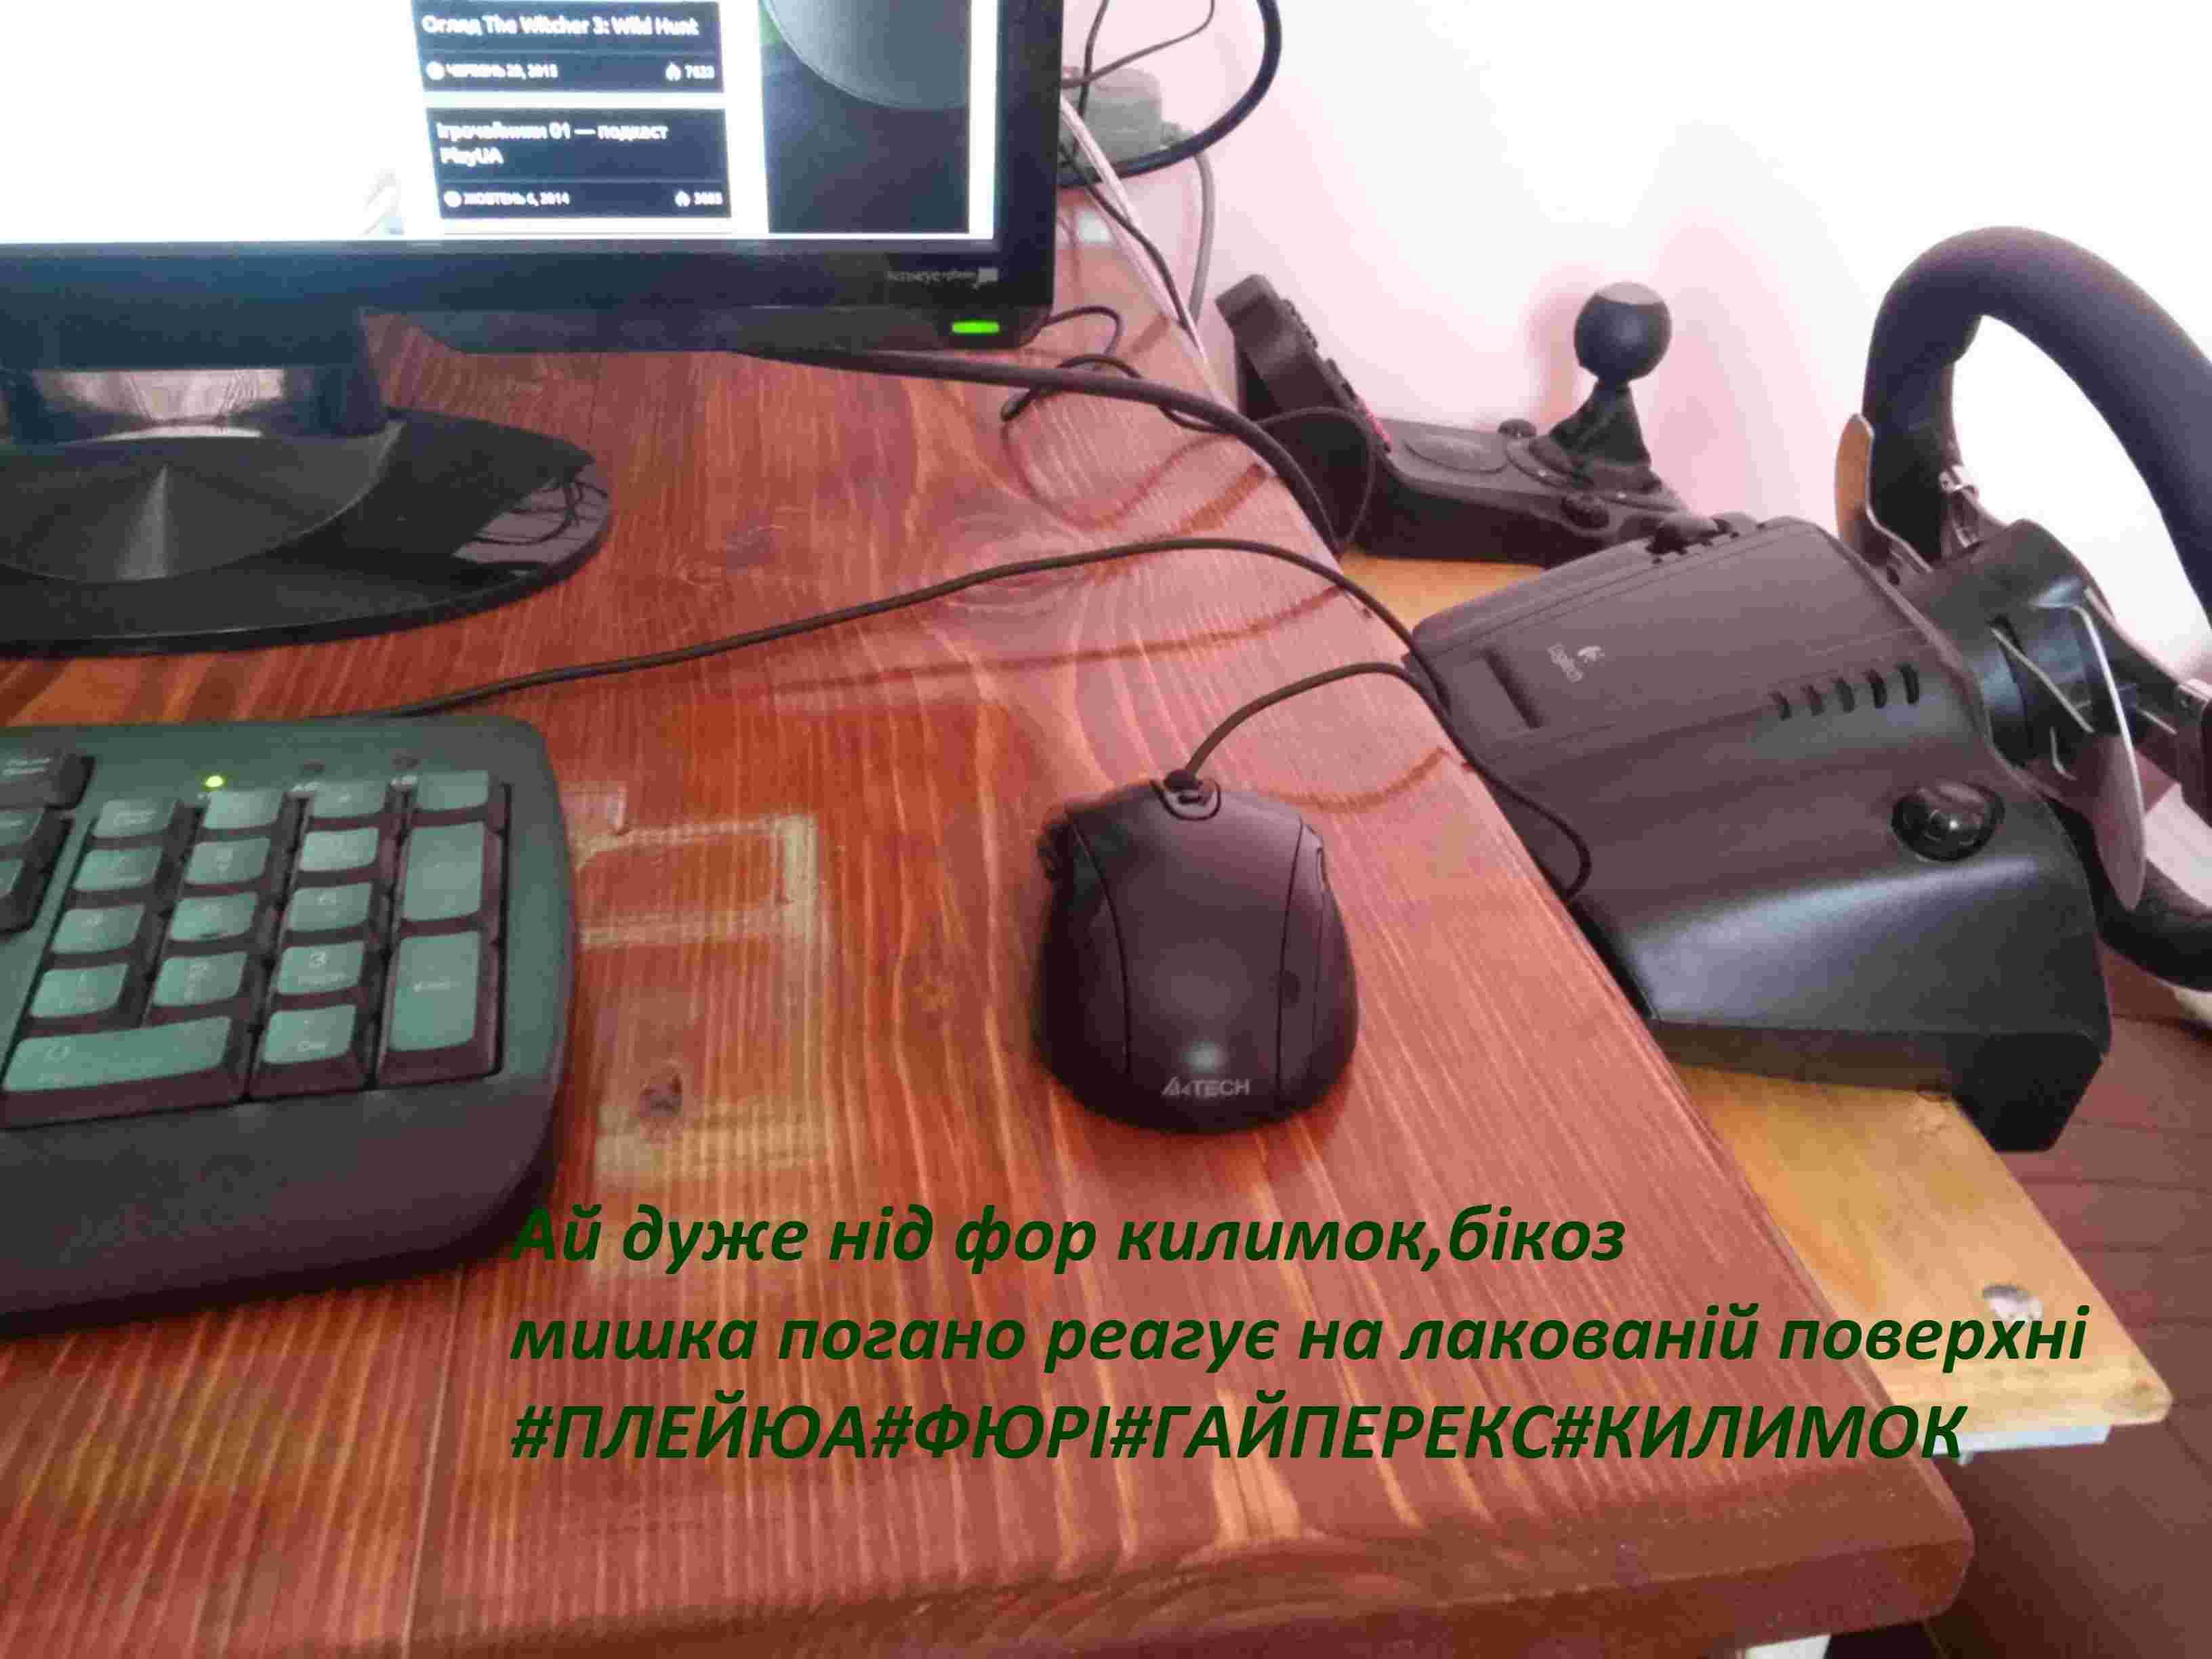 32 Ivan Khoptiy iv90khop@gmail